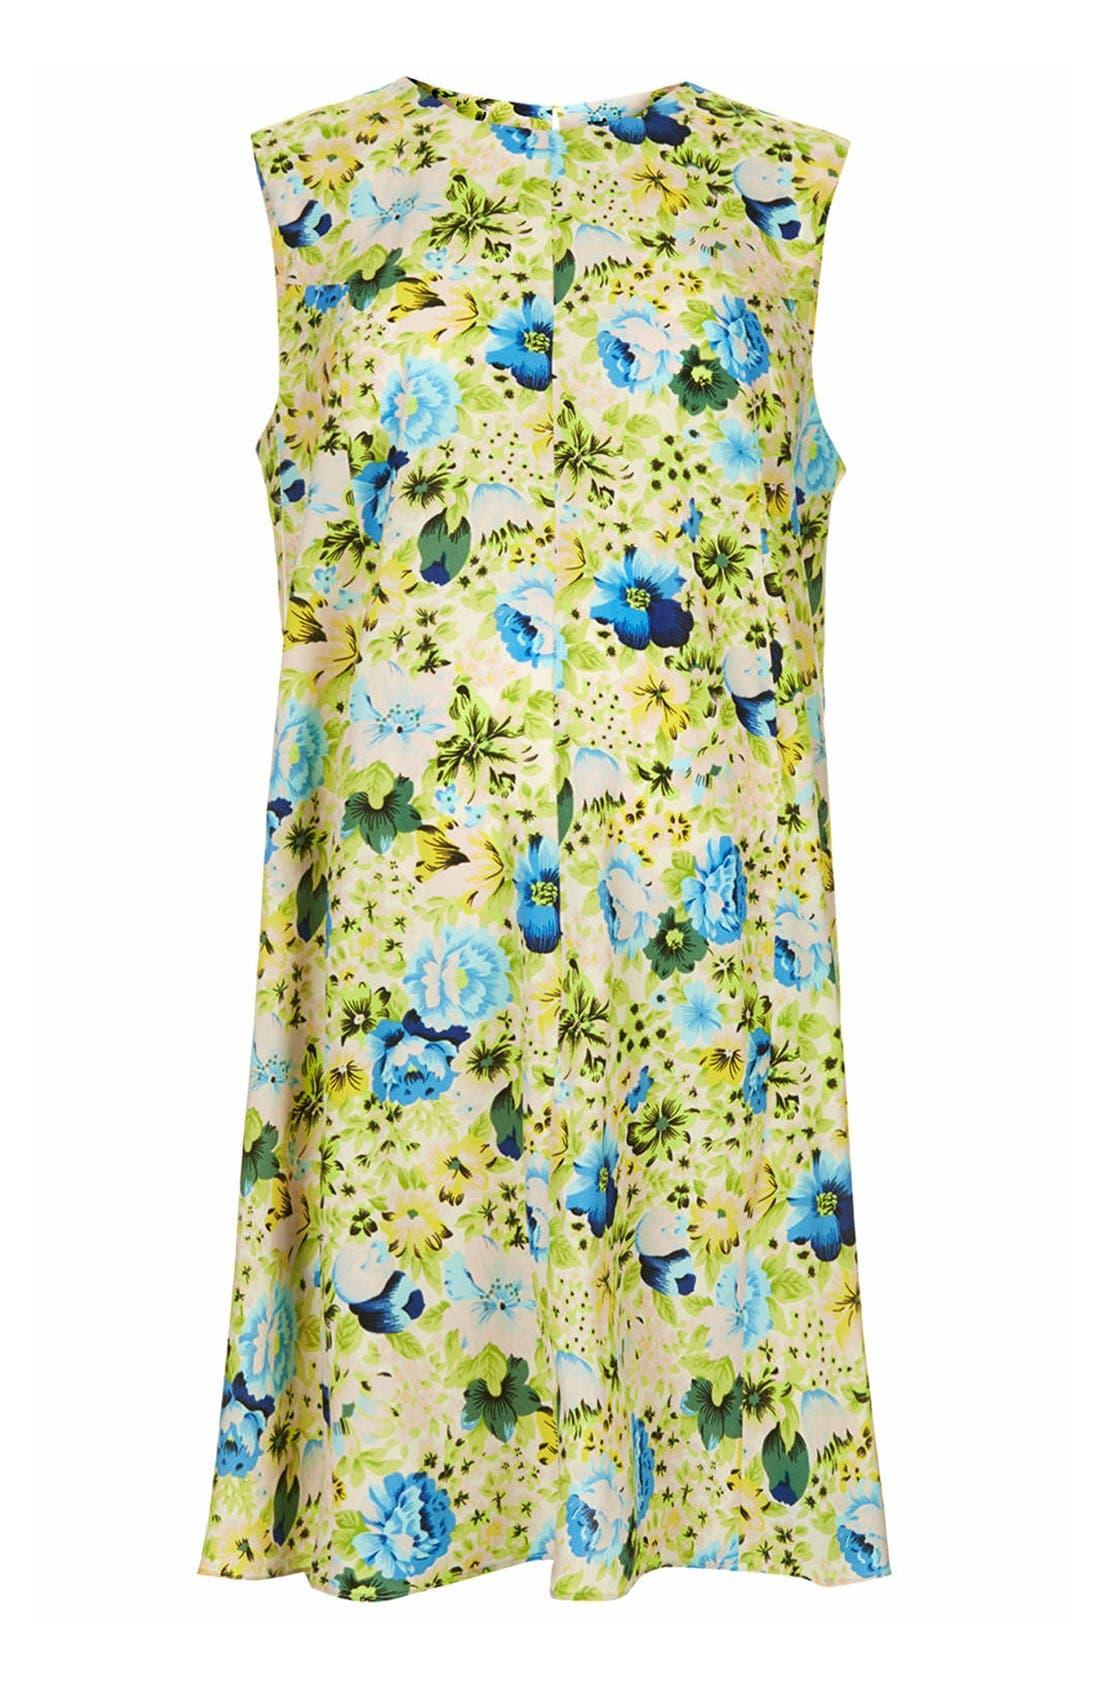 Alternate Image 1 Selected - Topshop Floral Print Maternity Swing Dress